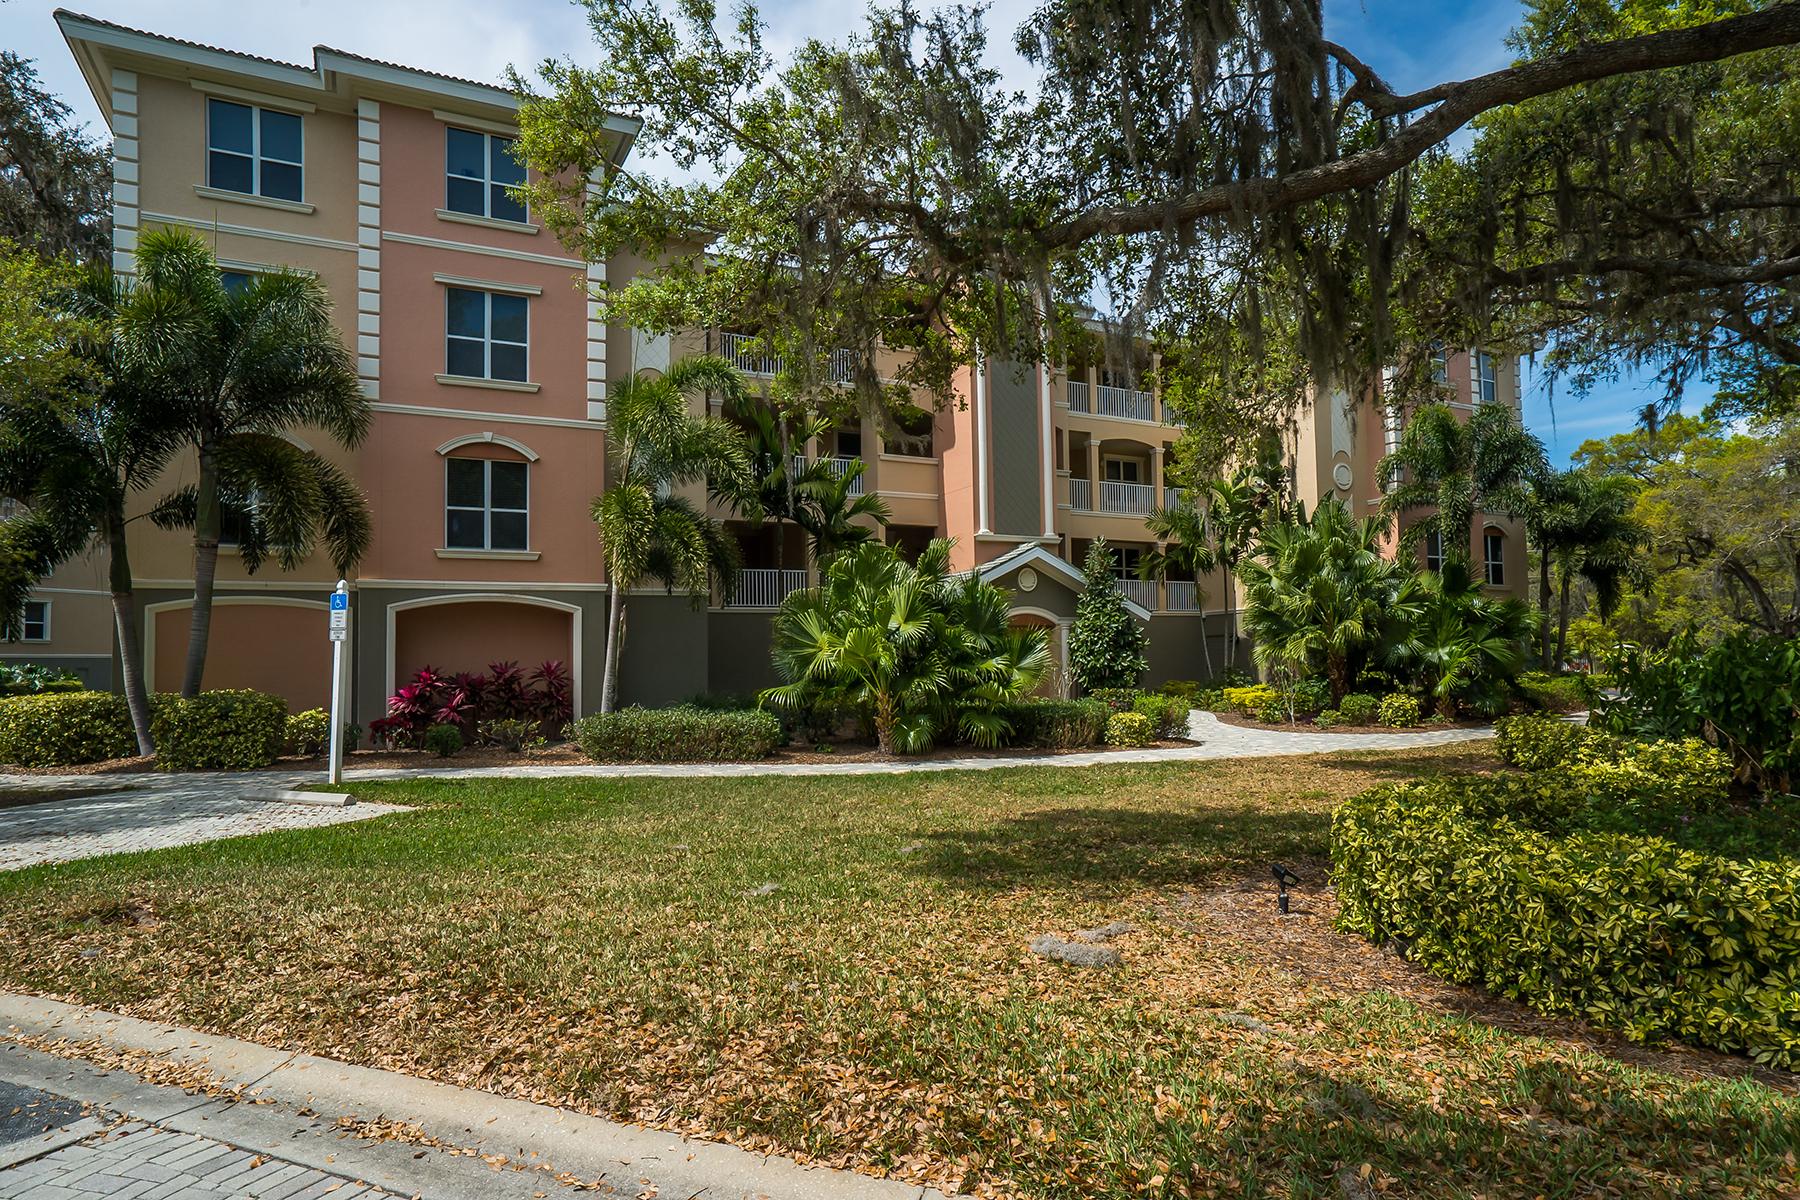 共管物業 為 出售 在 GRAND OAKS PRESERVE 5110 Manorwood Dr 3D Sarasota, 佛羅里達州, 34235 美國